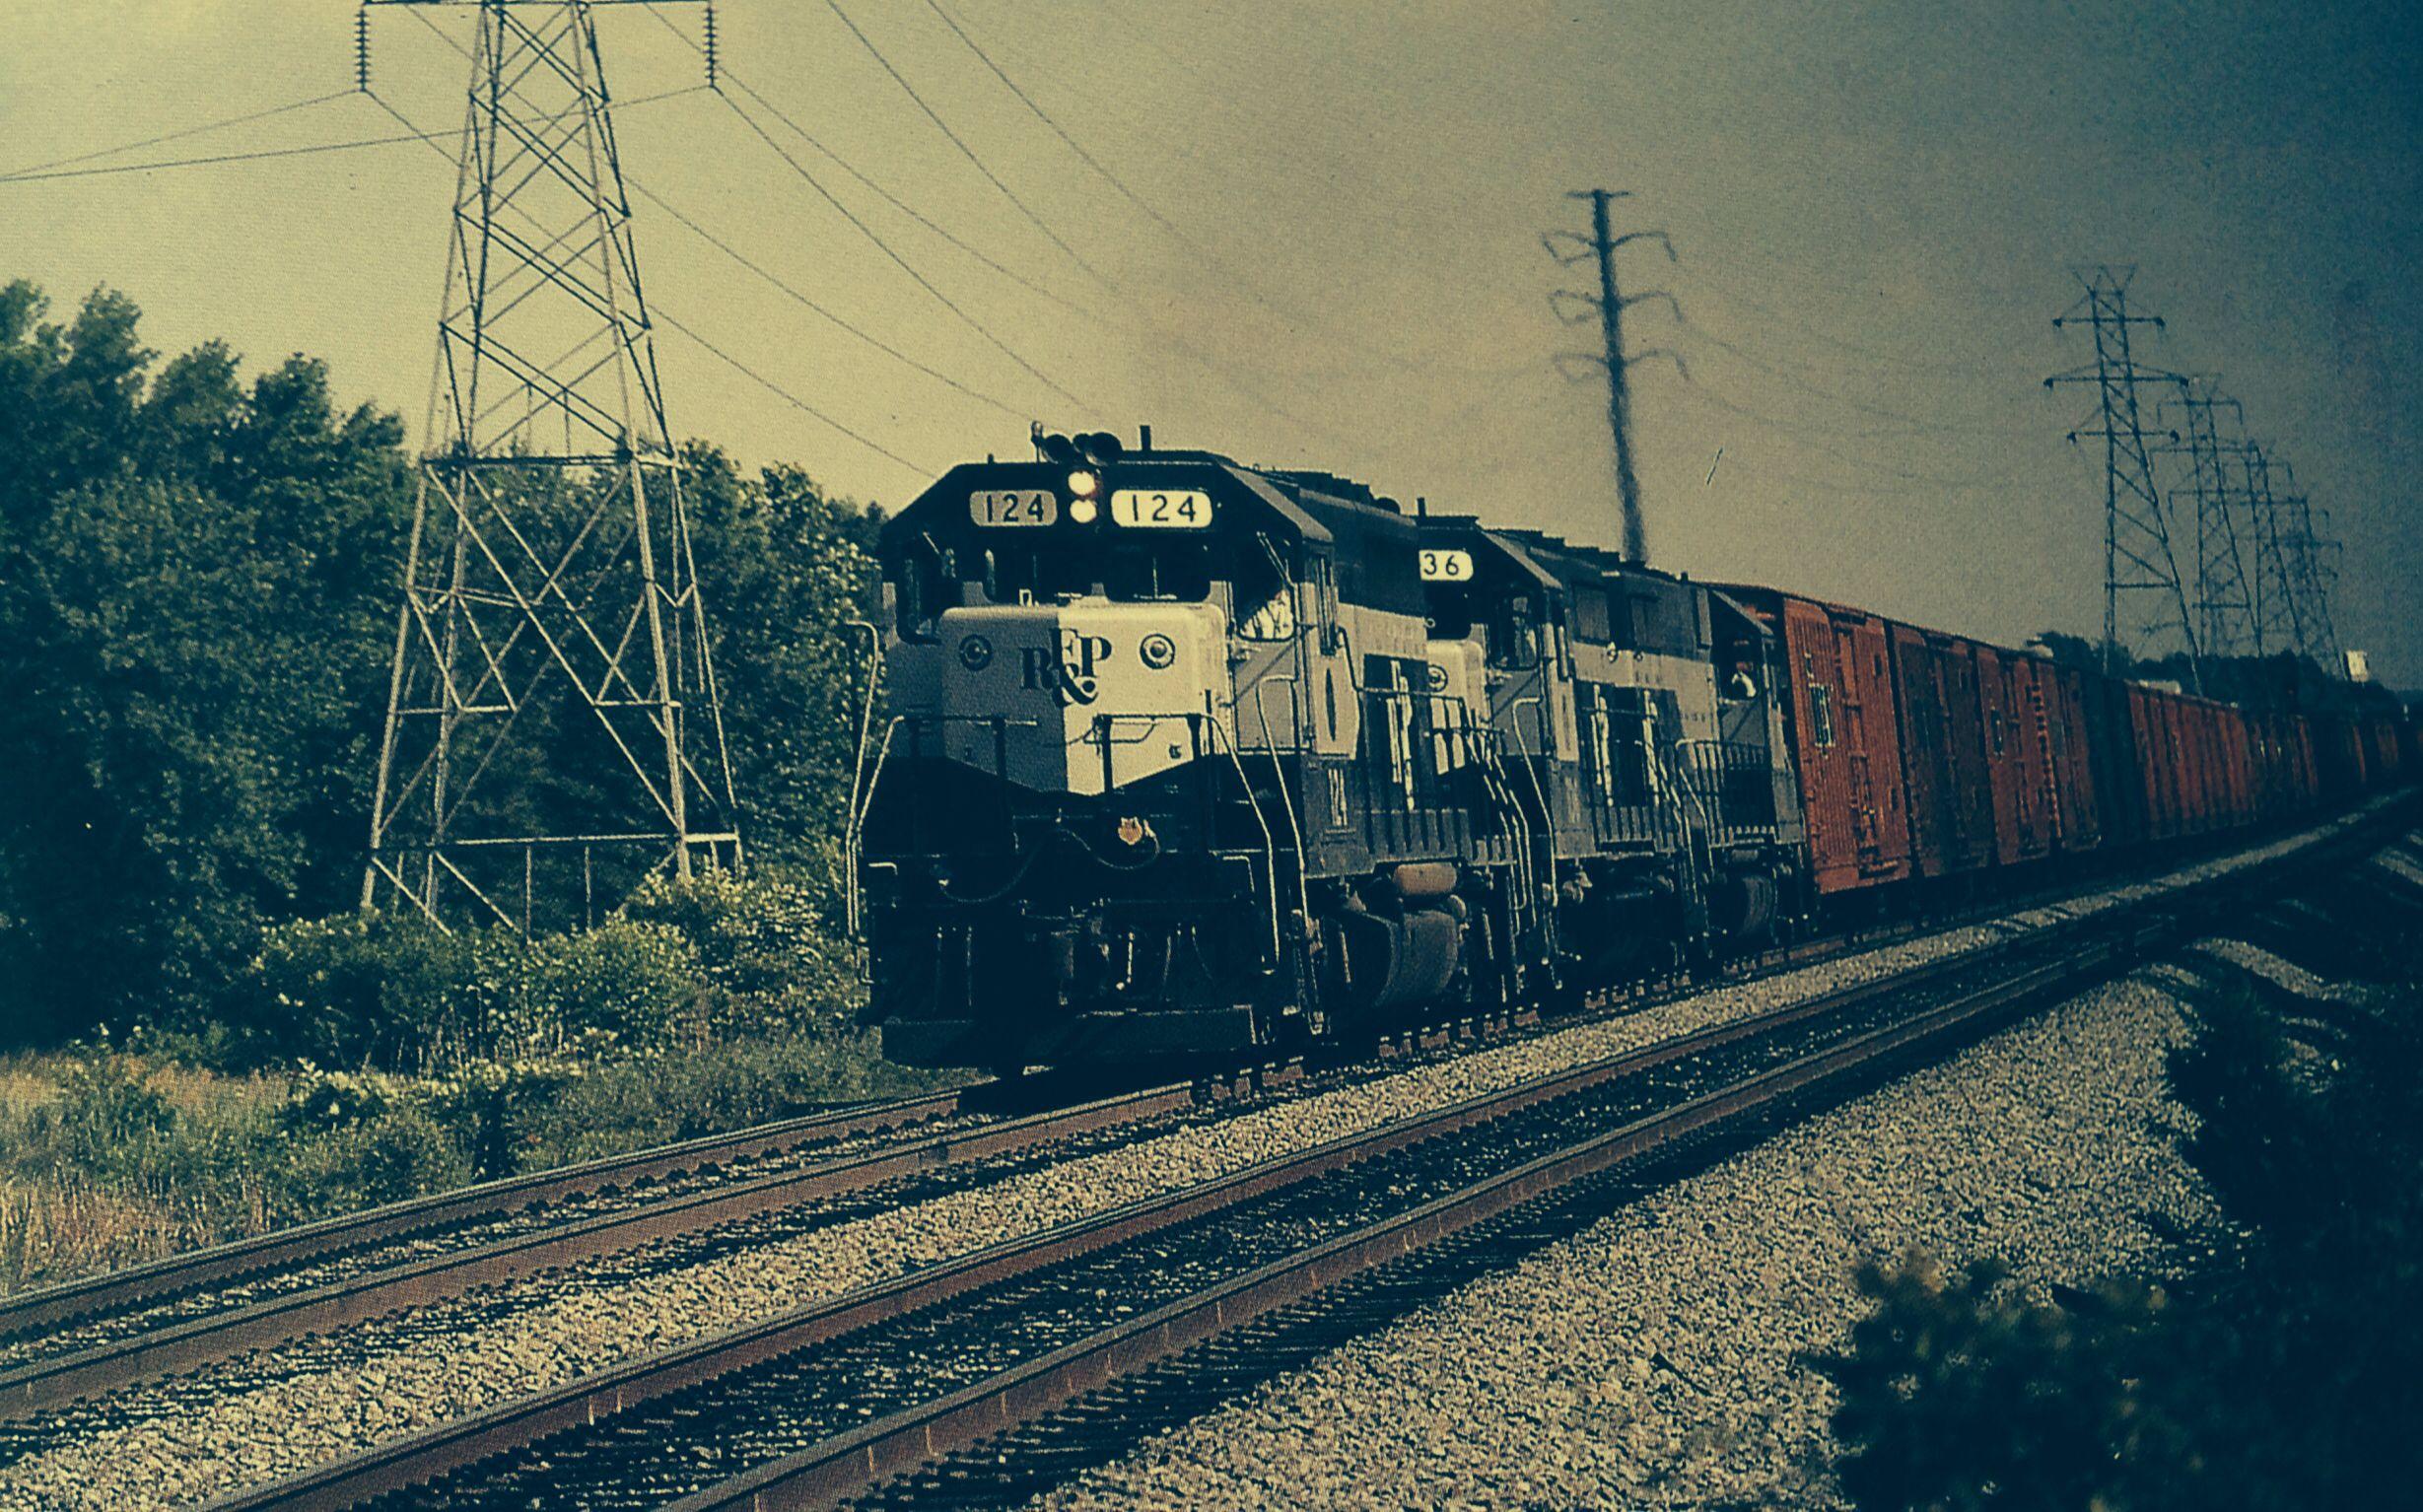 The Juice Train | RF&P RR | Train, Csx transportation, Locomotive on